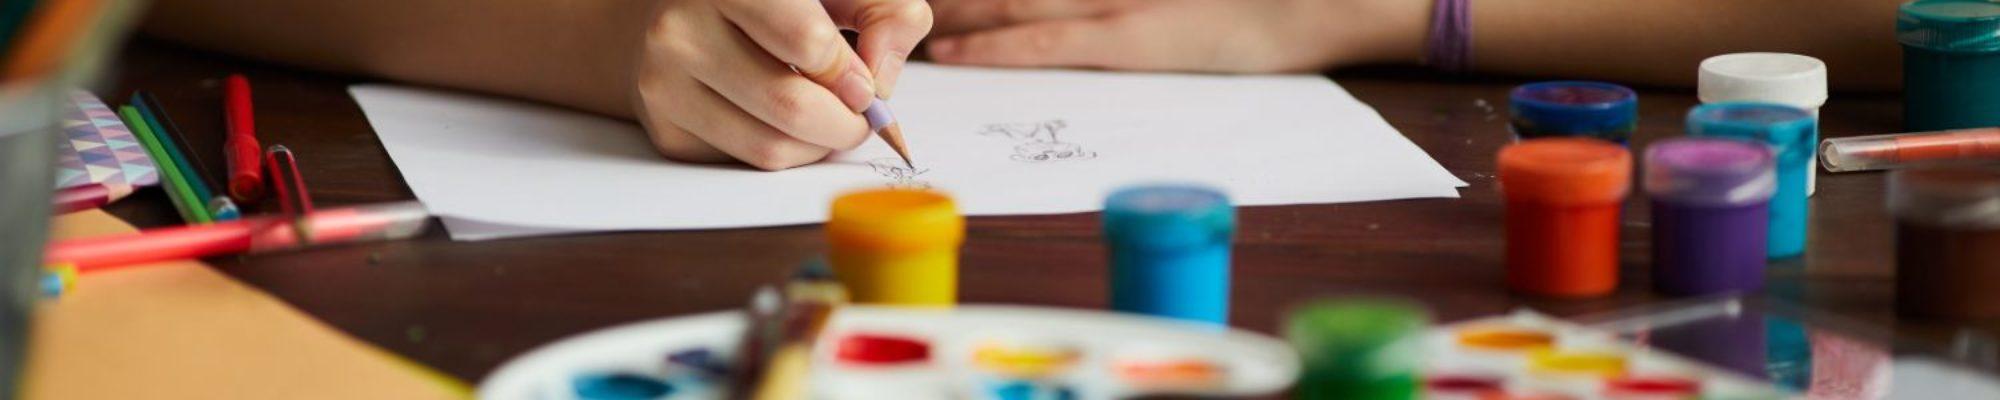 talented-girl-drawing-closeup-MZFU9Y5